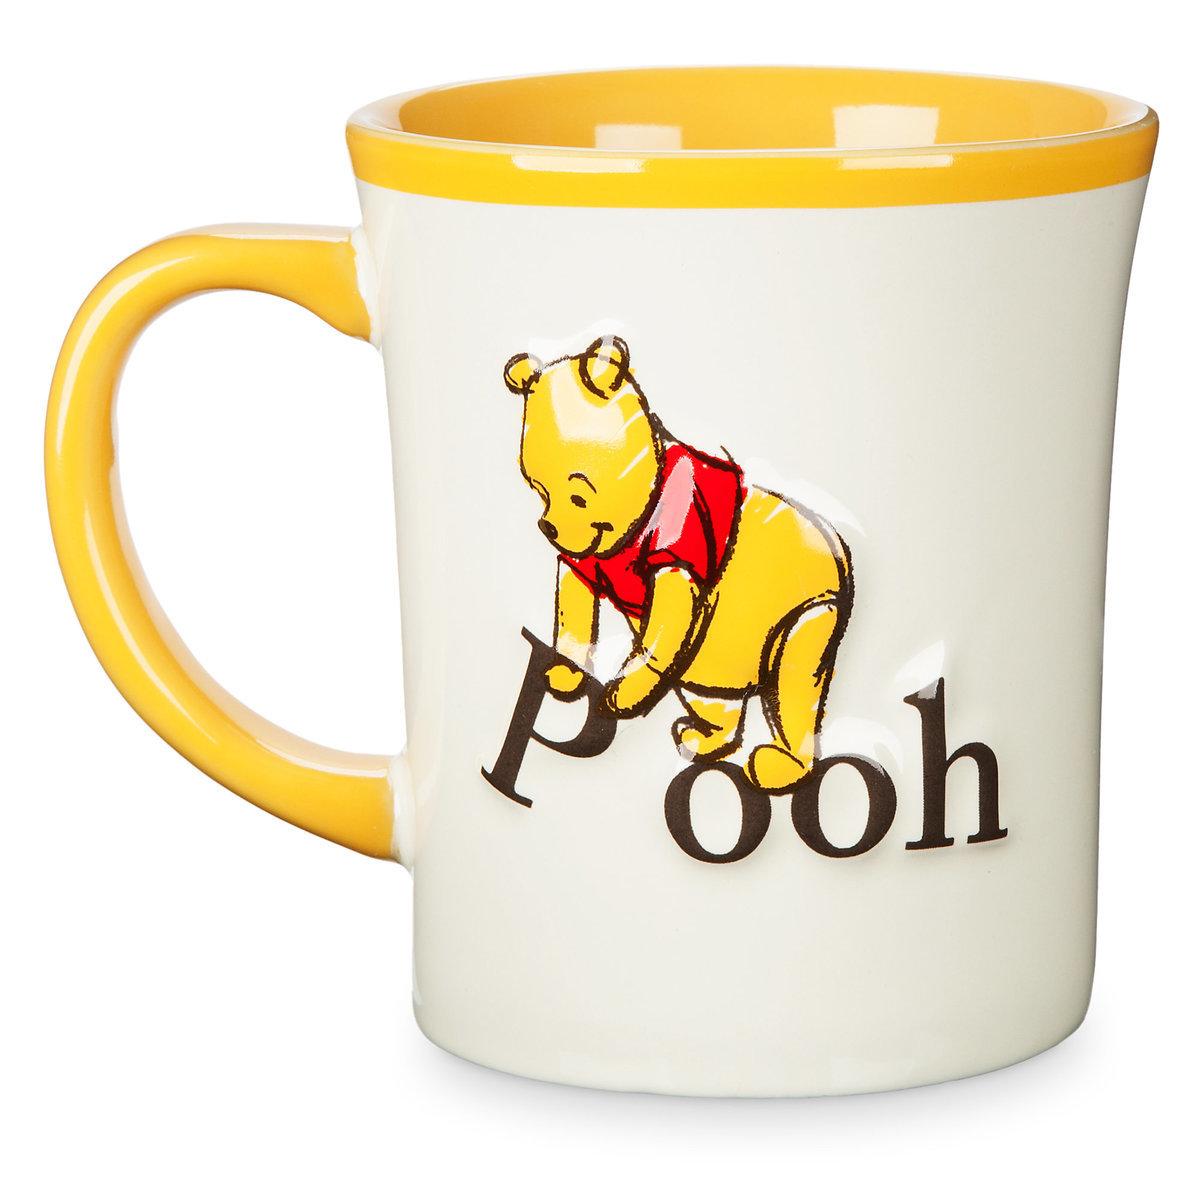 Disney Coffee Cup Mug Winnie The Pooh Storybook Mug